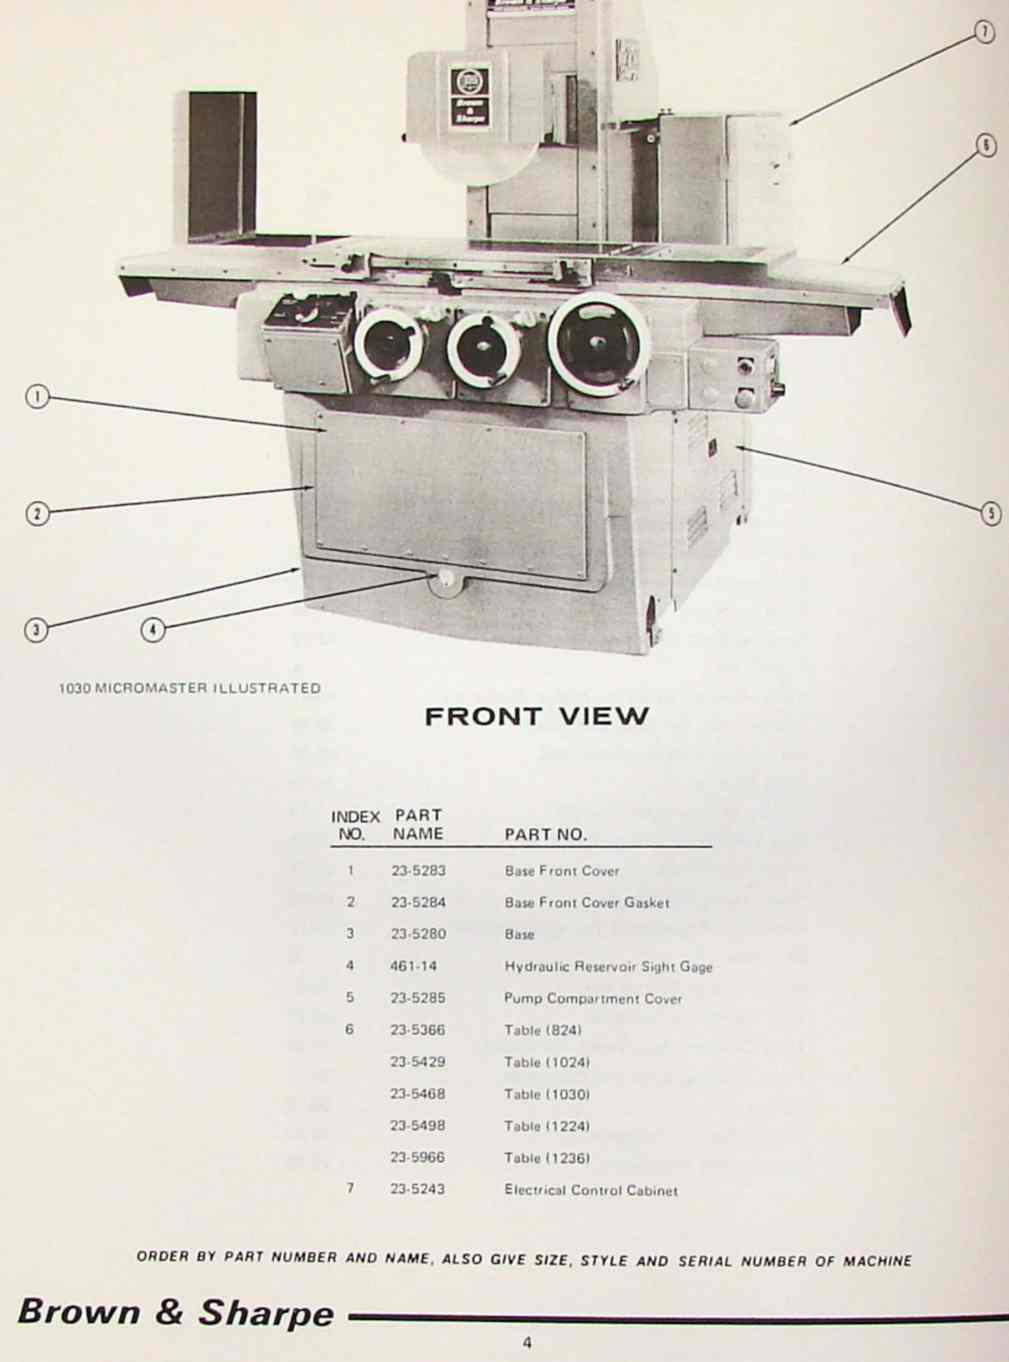 Brown Sharpe Surface Grinder Wiring Diagram Free Download Micromaster Grinders Parts Manual Ozark Robot At